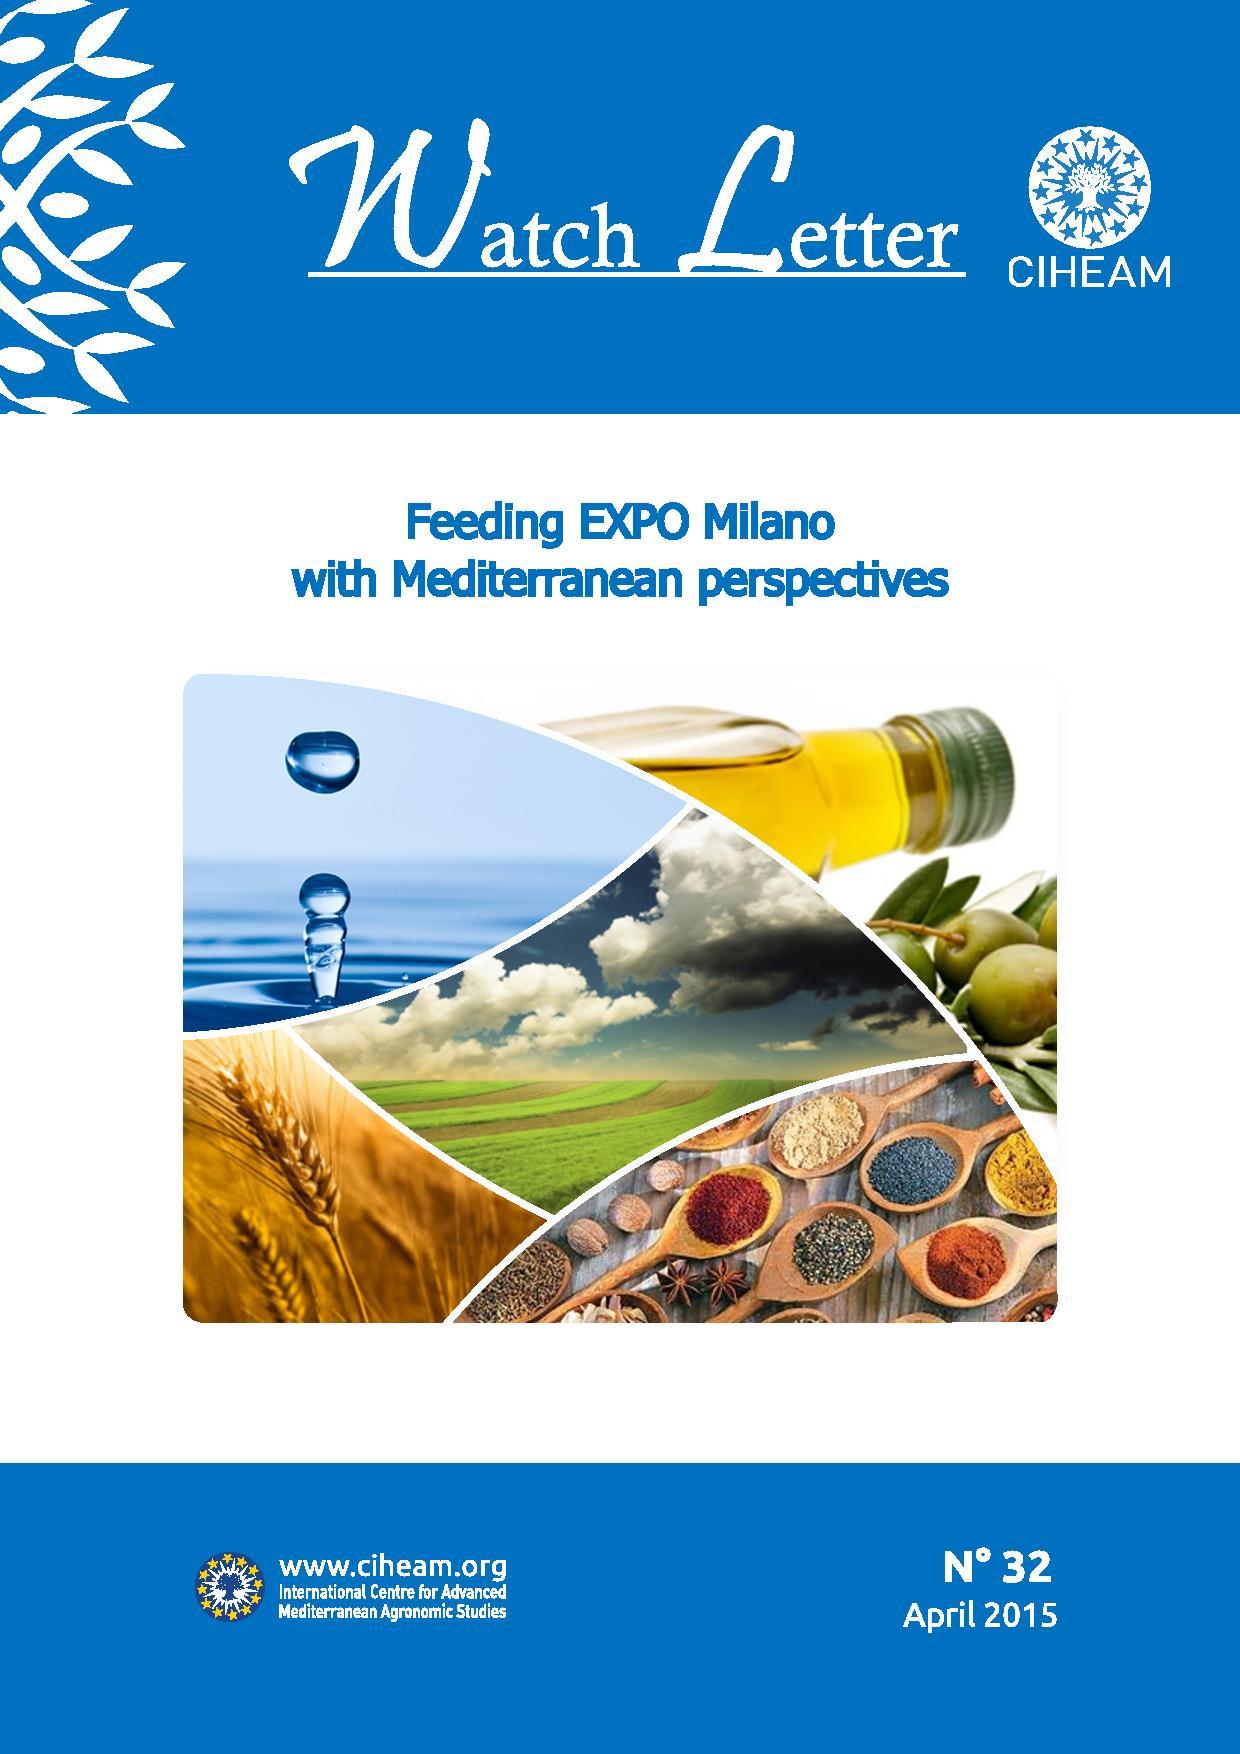 WL 32 Feeding Expo Milano with Mediterranean perspectives